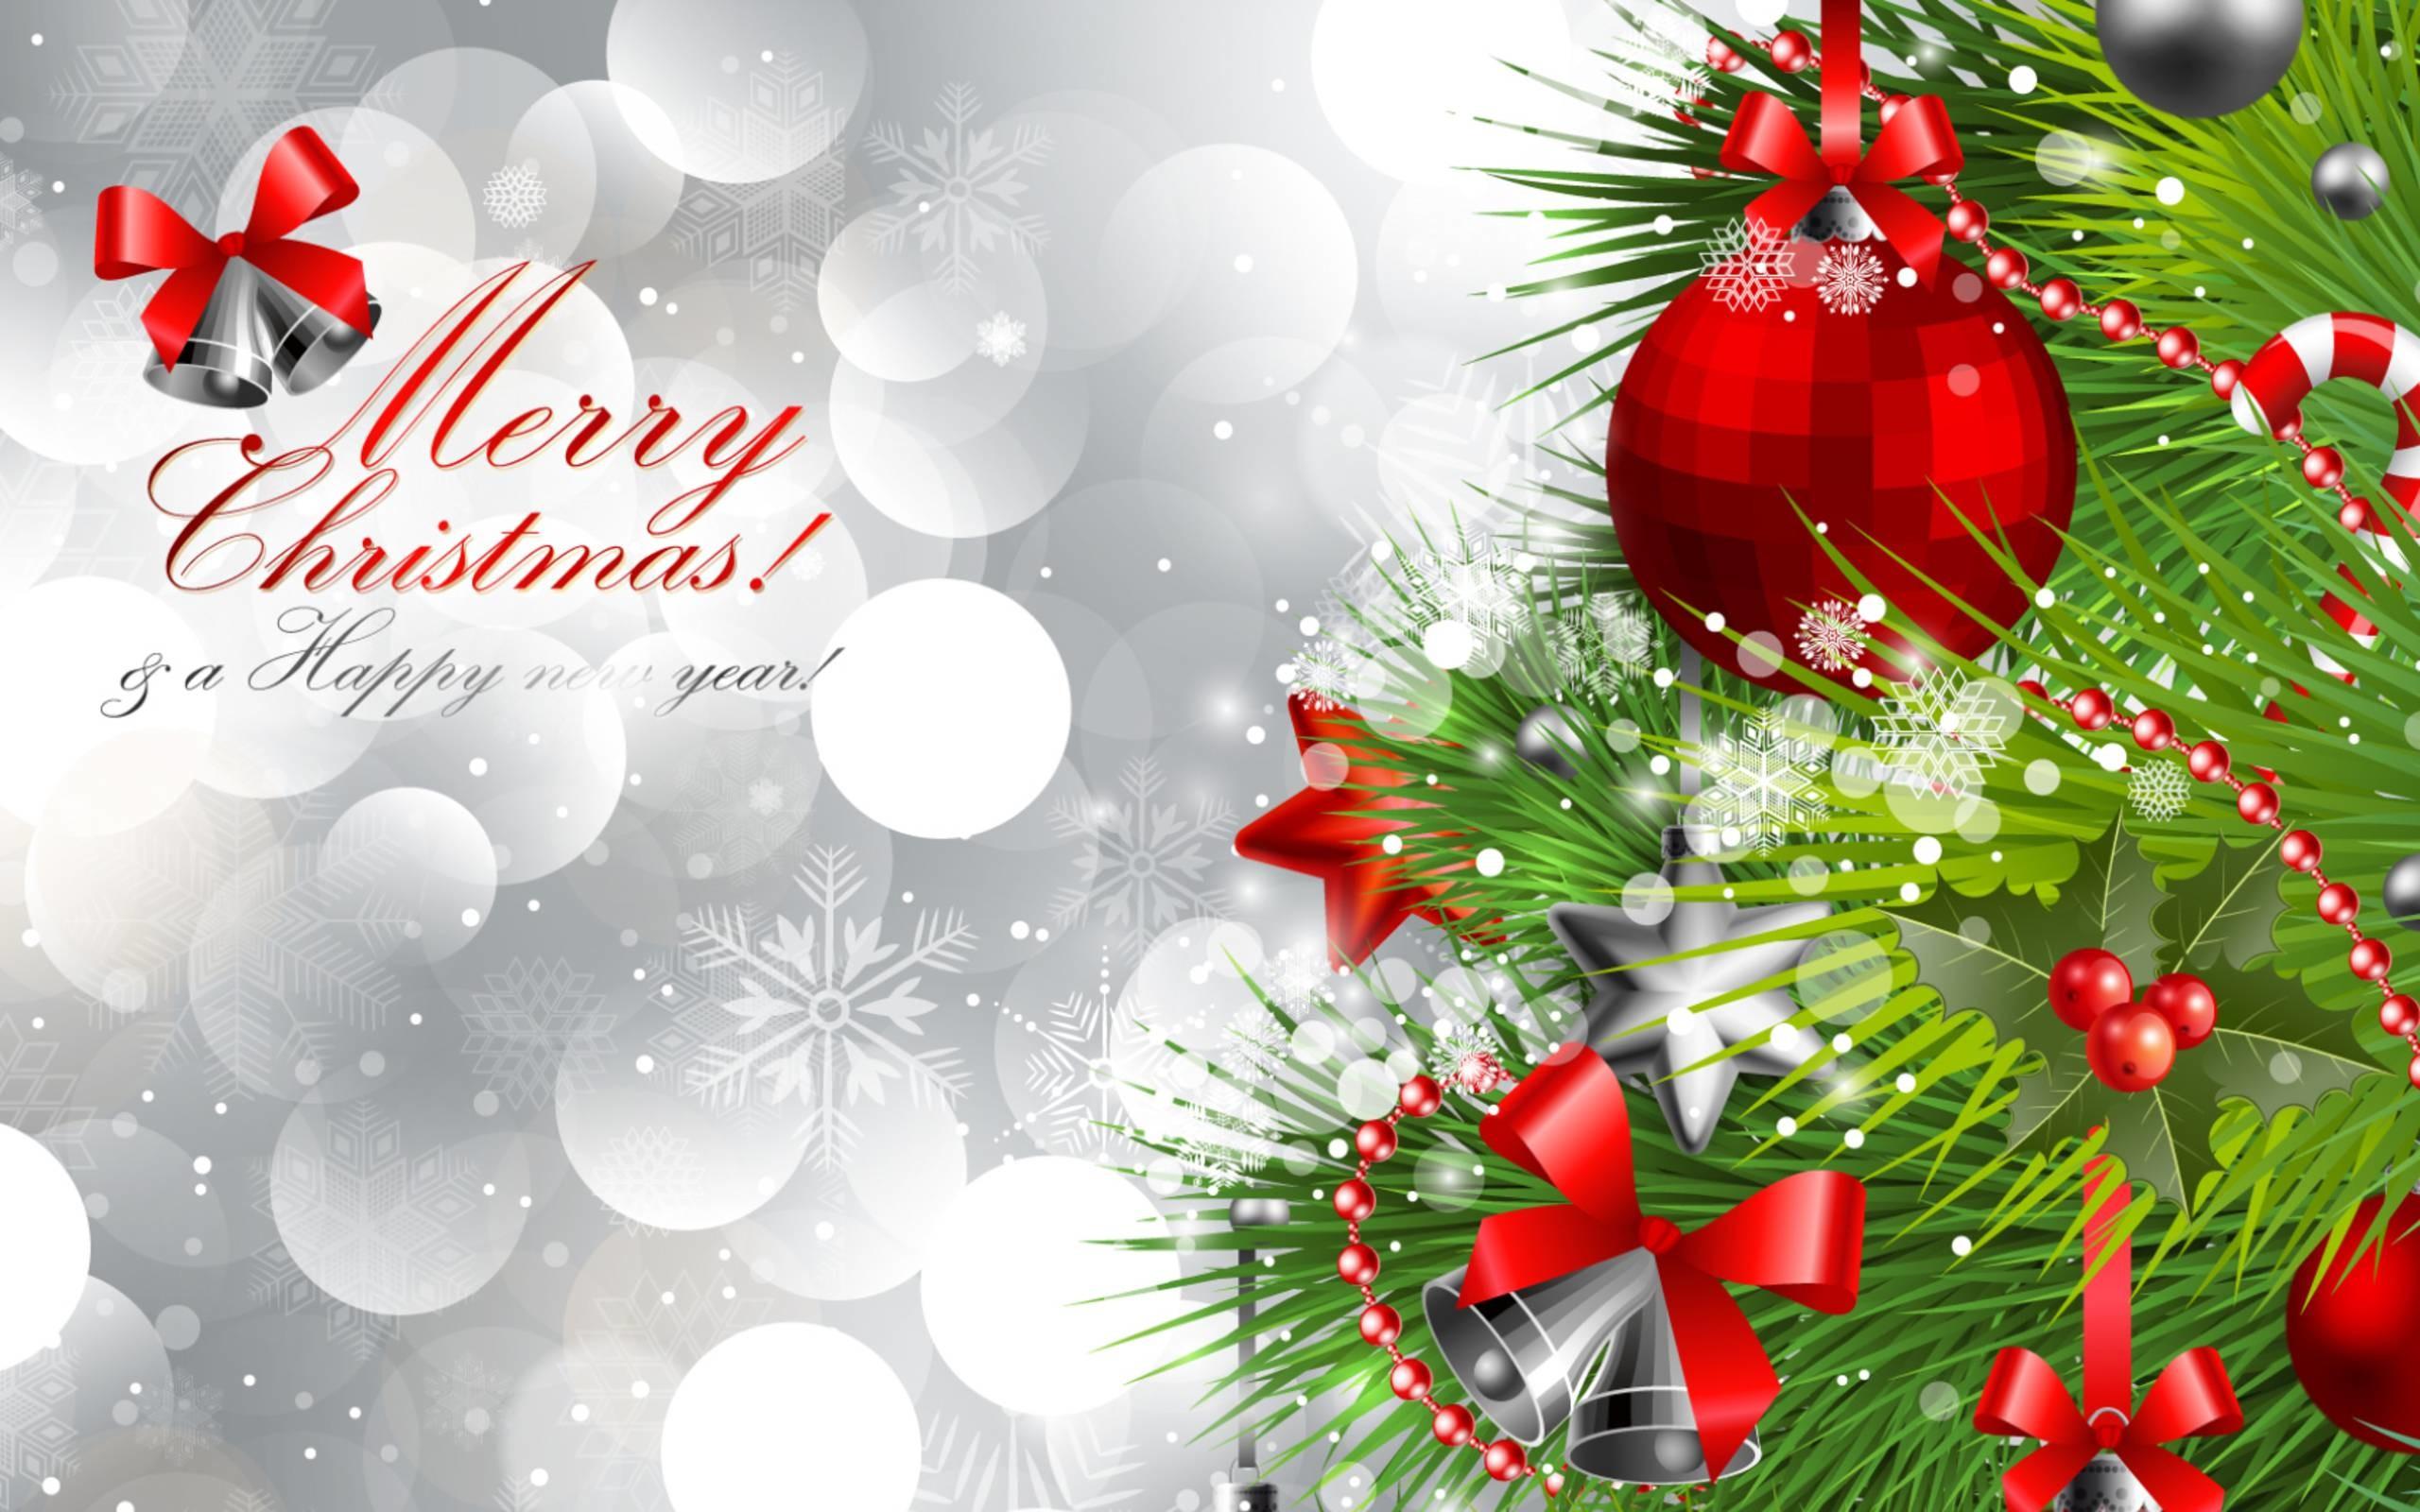 1920x1200 1920x1200 by gudrun hankey pc97 happy new year backgrounds